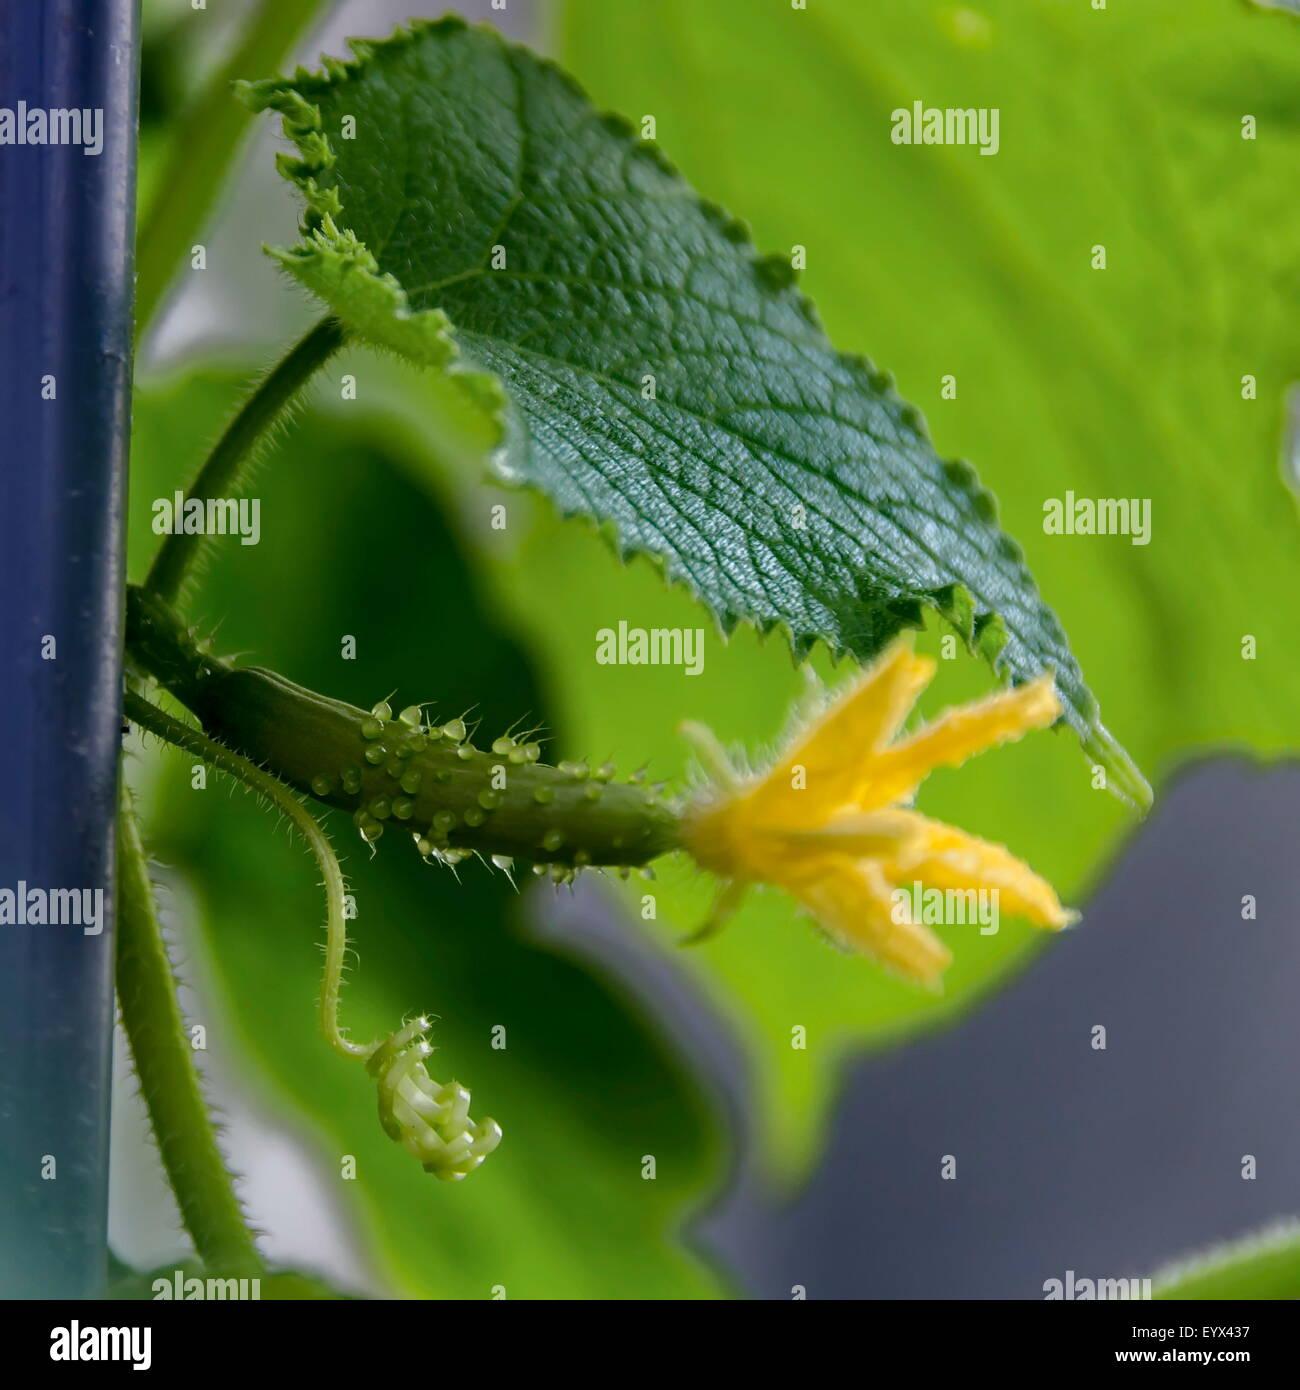 Just germ of cucumber in balcony garden - Stock Image